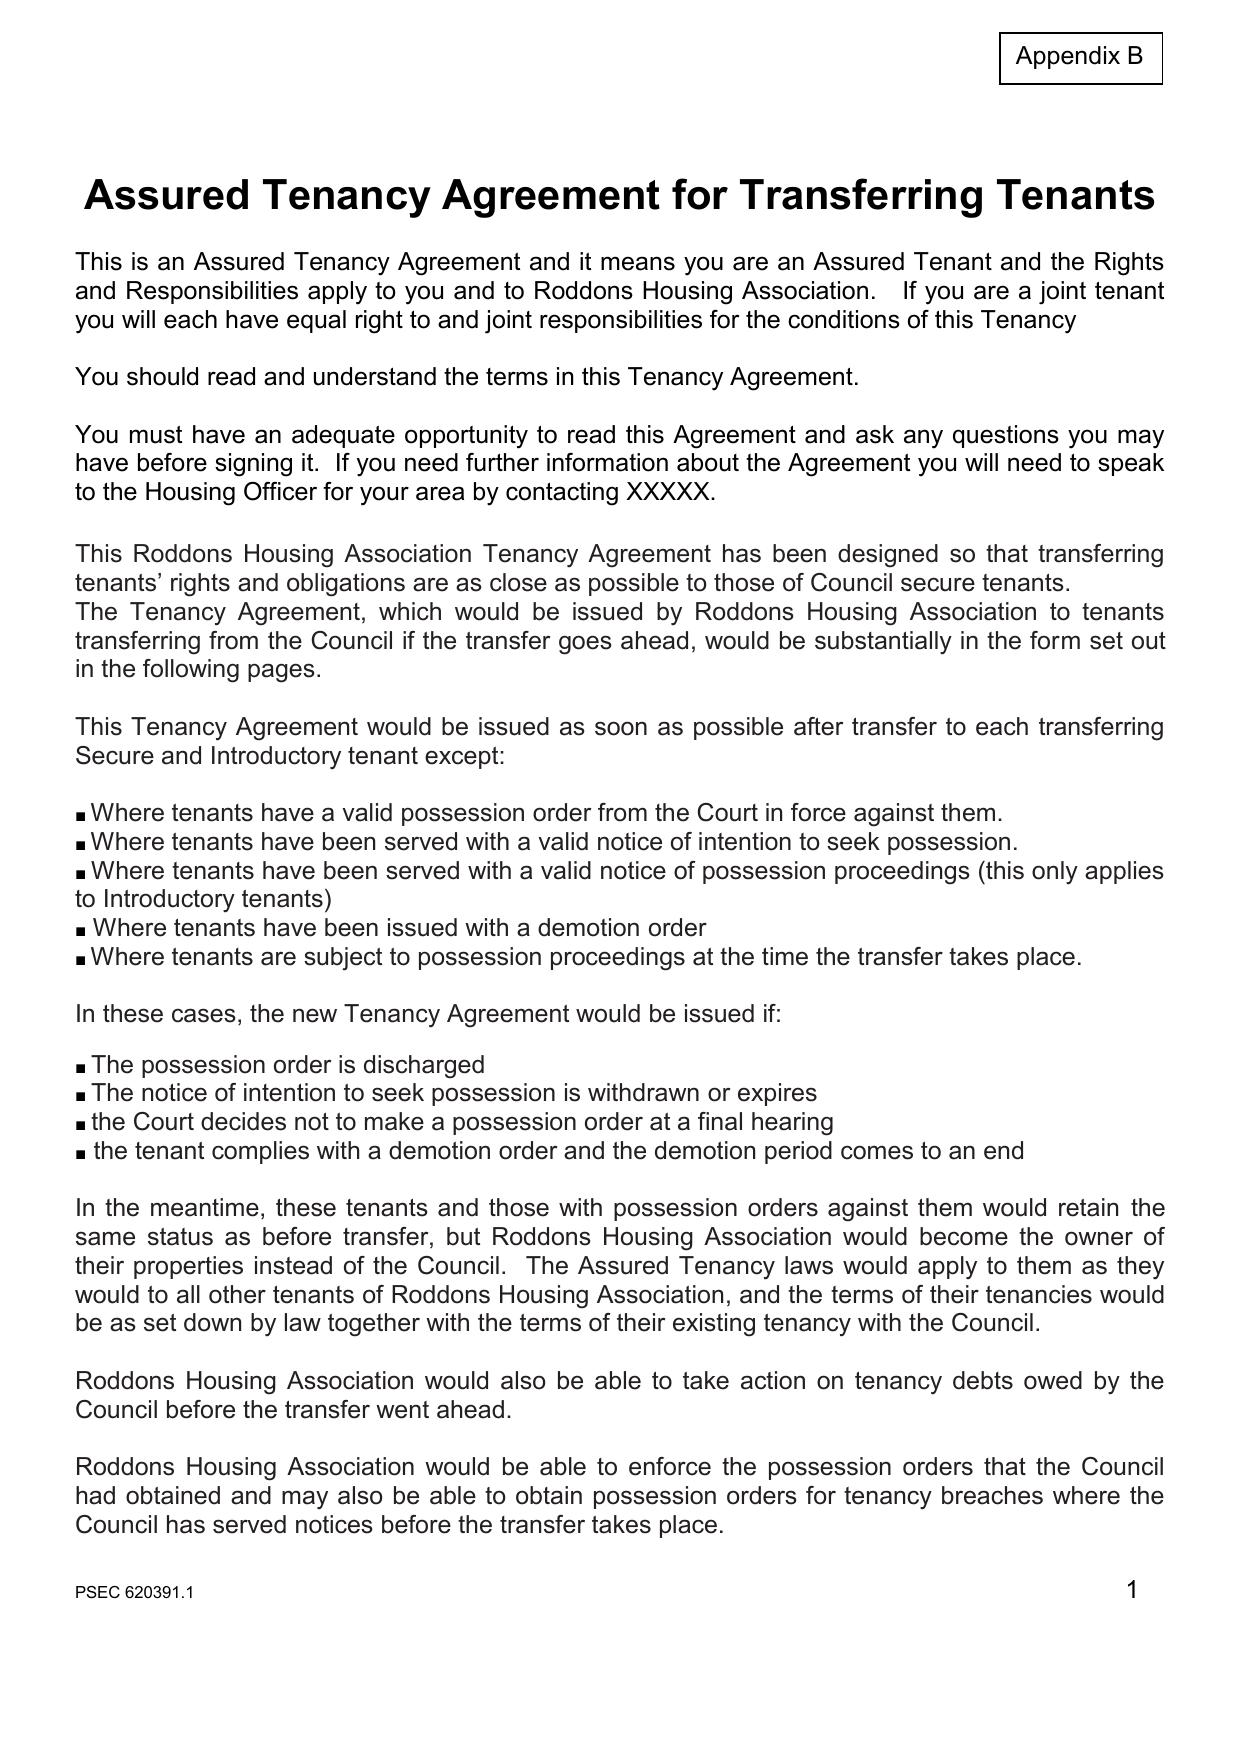 Assured Tenancy Agreement For Transferring Tenants